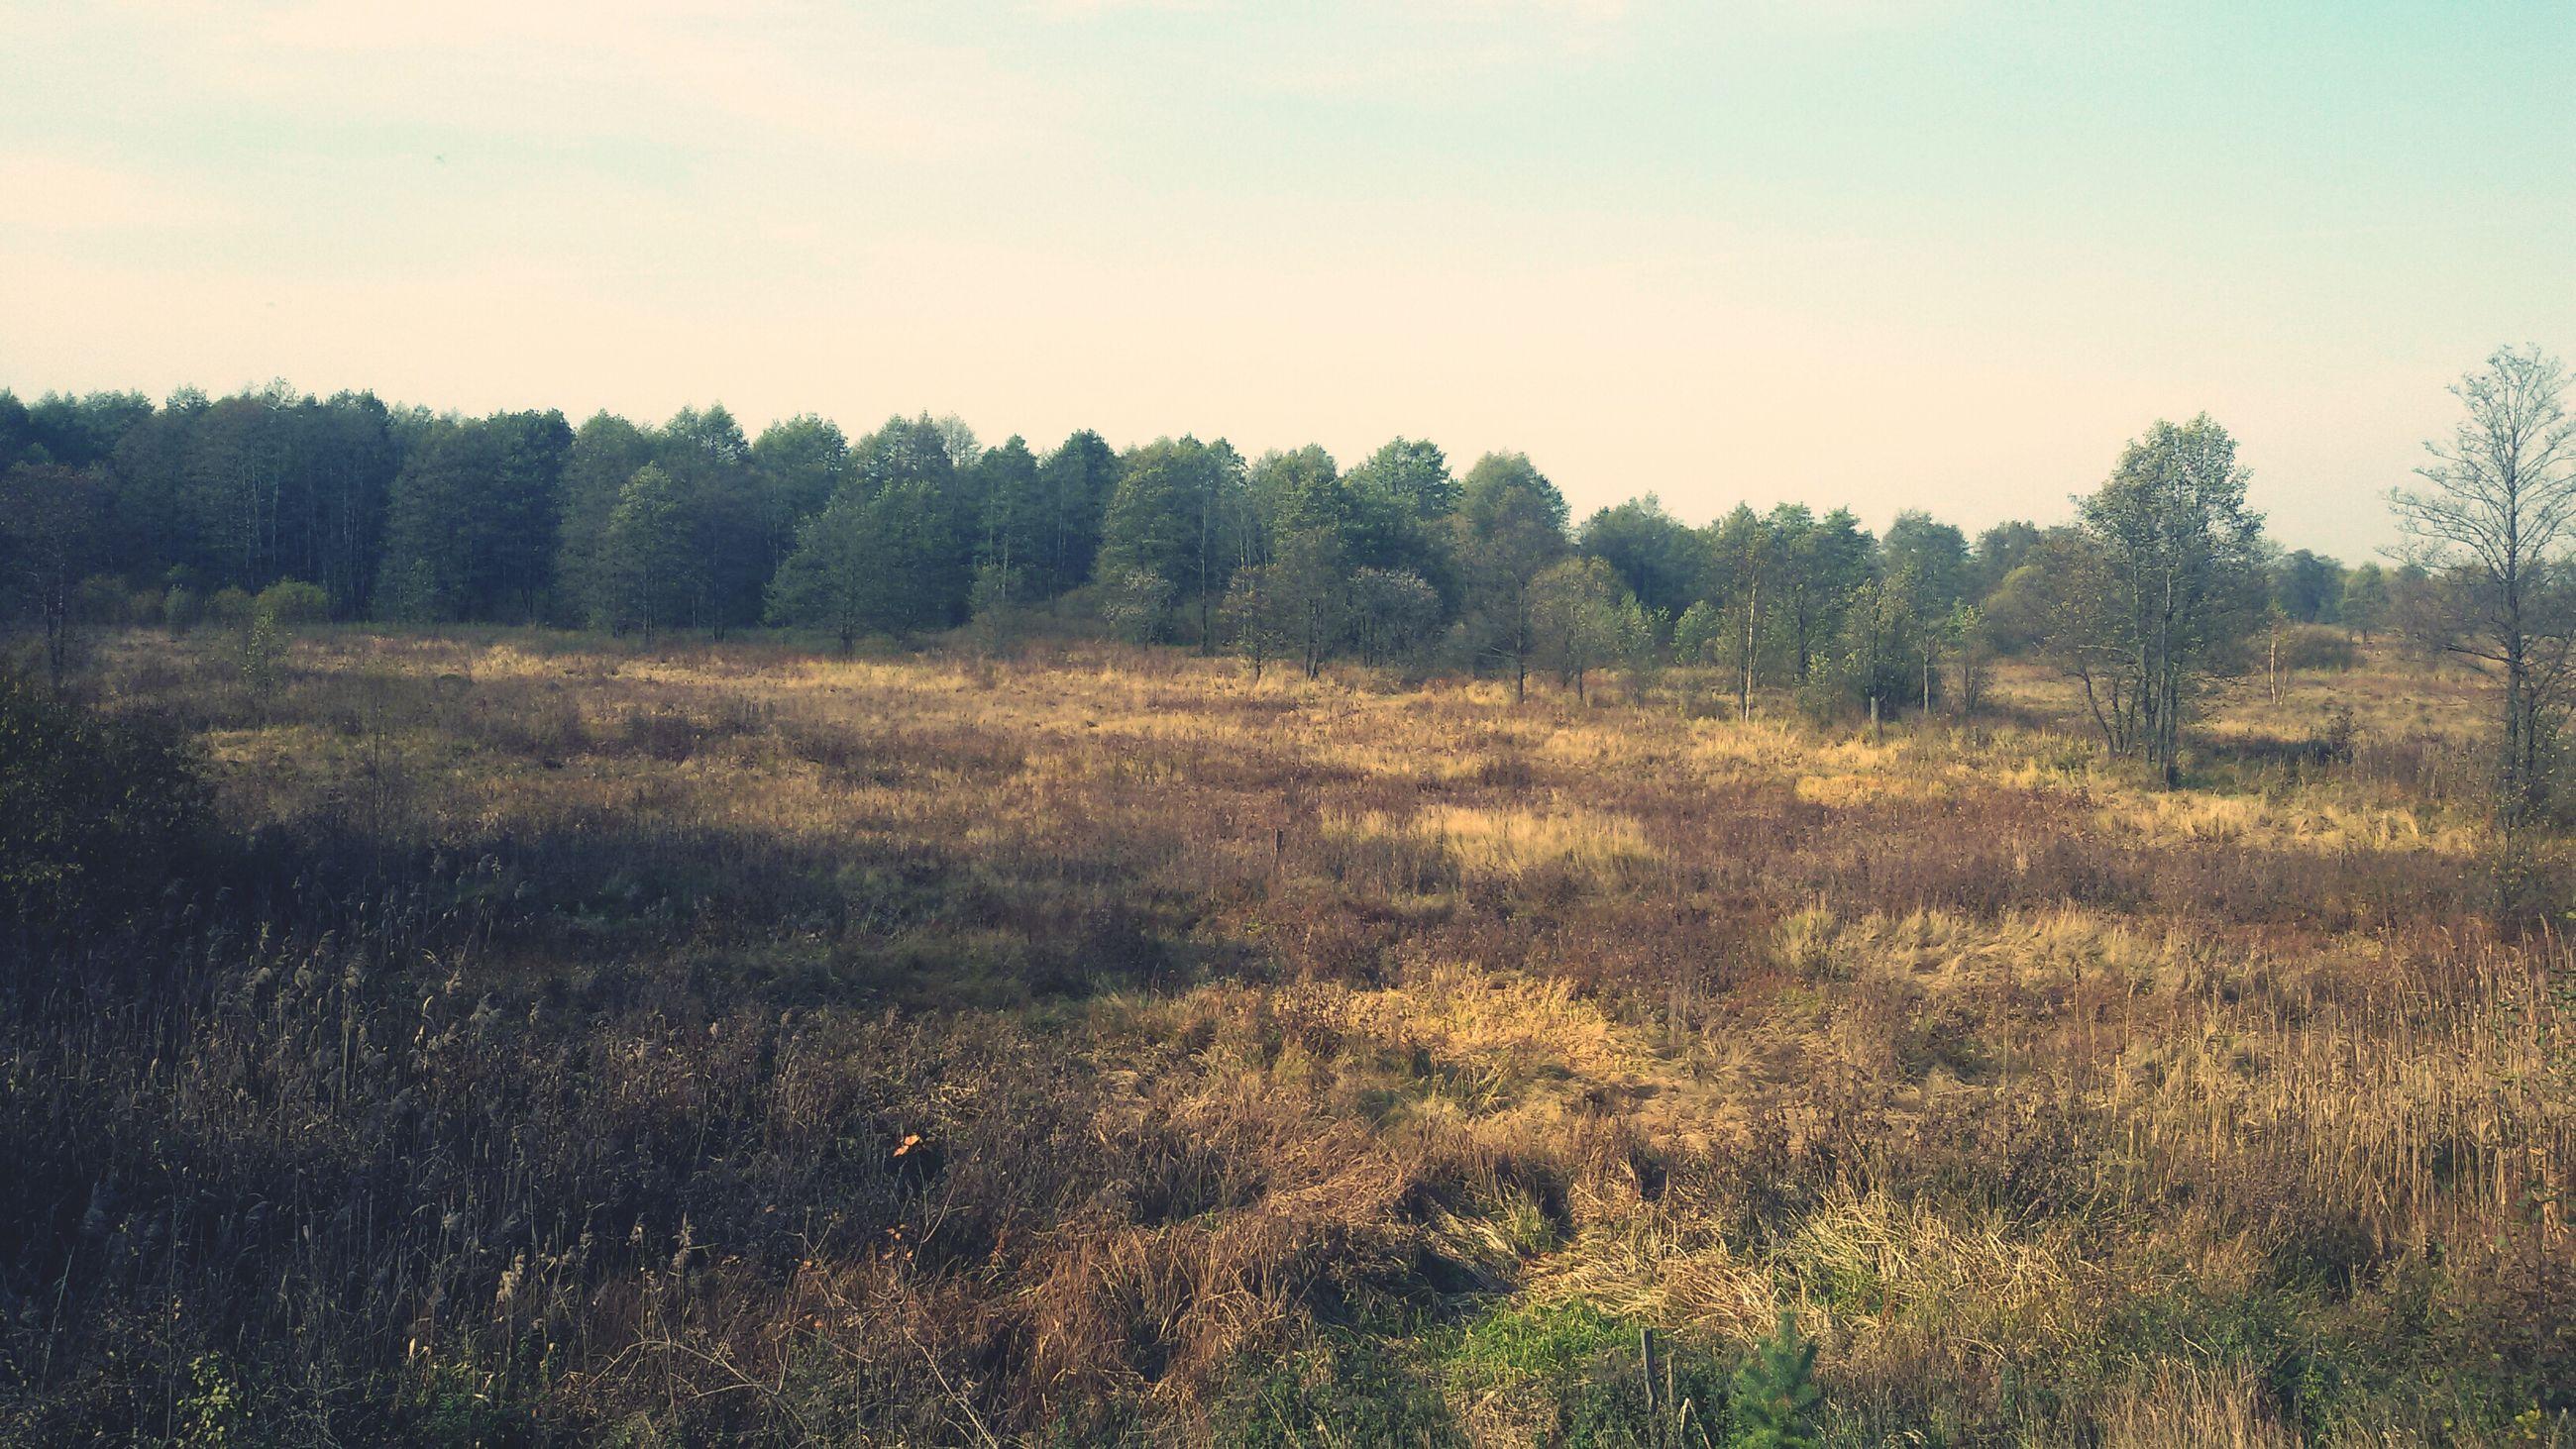 tranquil scene, tranquility, tree, landscape, field, growth, scenics, beauty in nature, grass, nature, clear sky, sky, plant, non-urban scene, forest, copy space, idyllic, grassy, remote, non urban scene